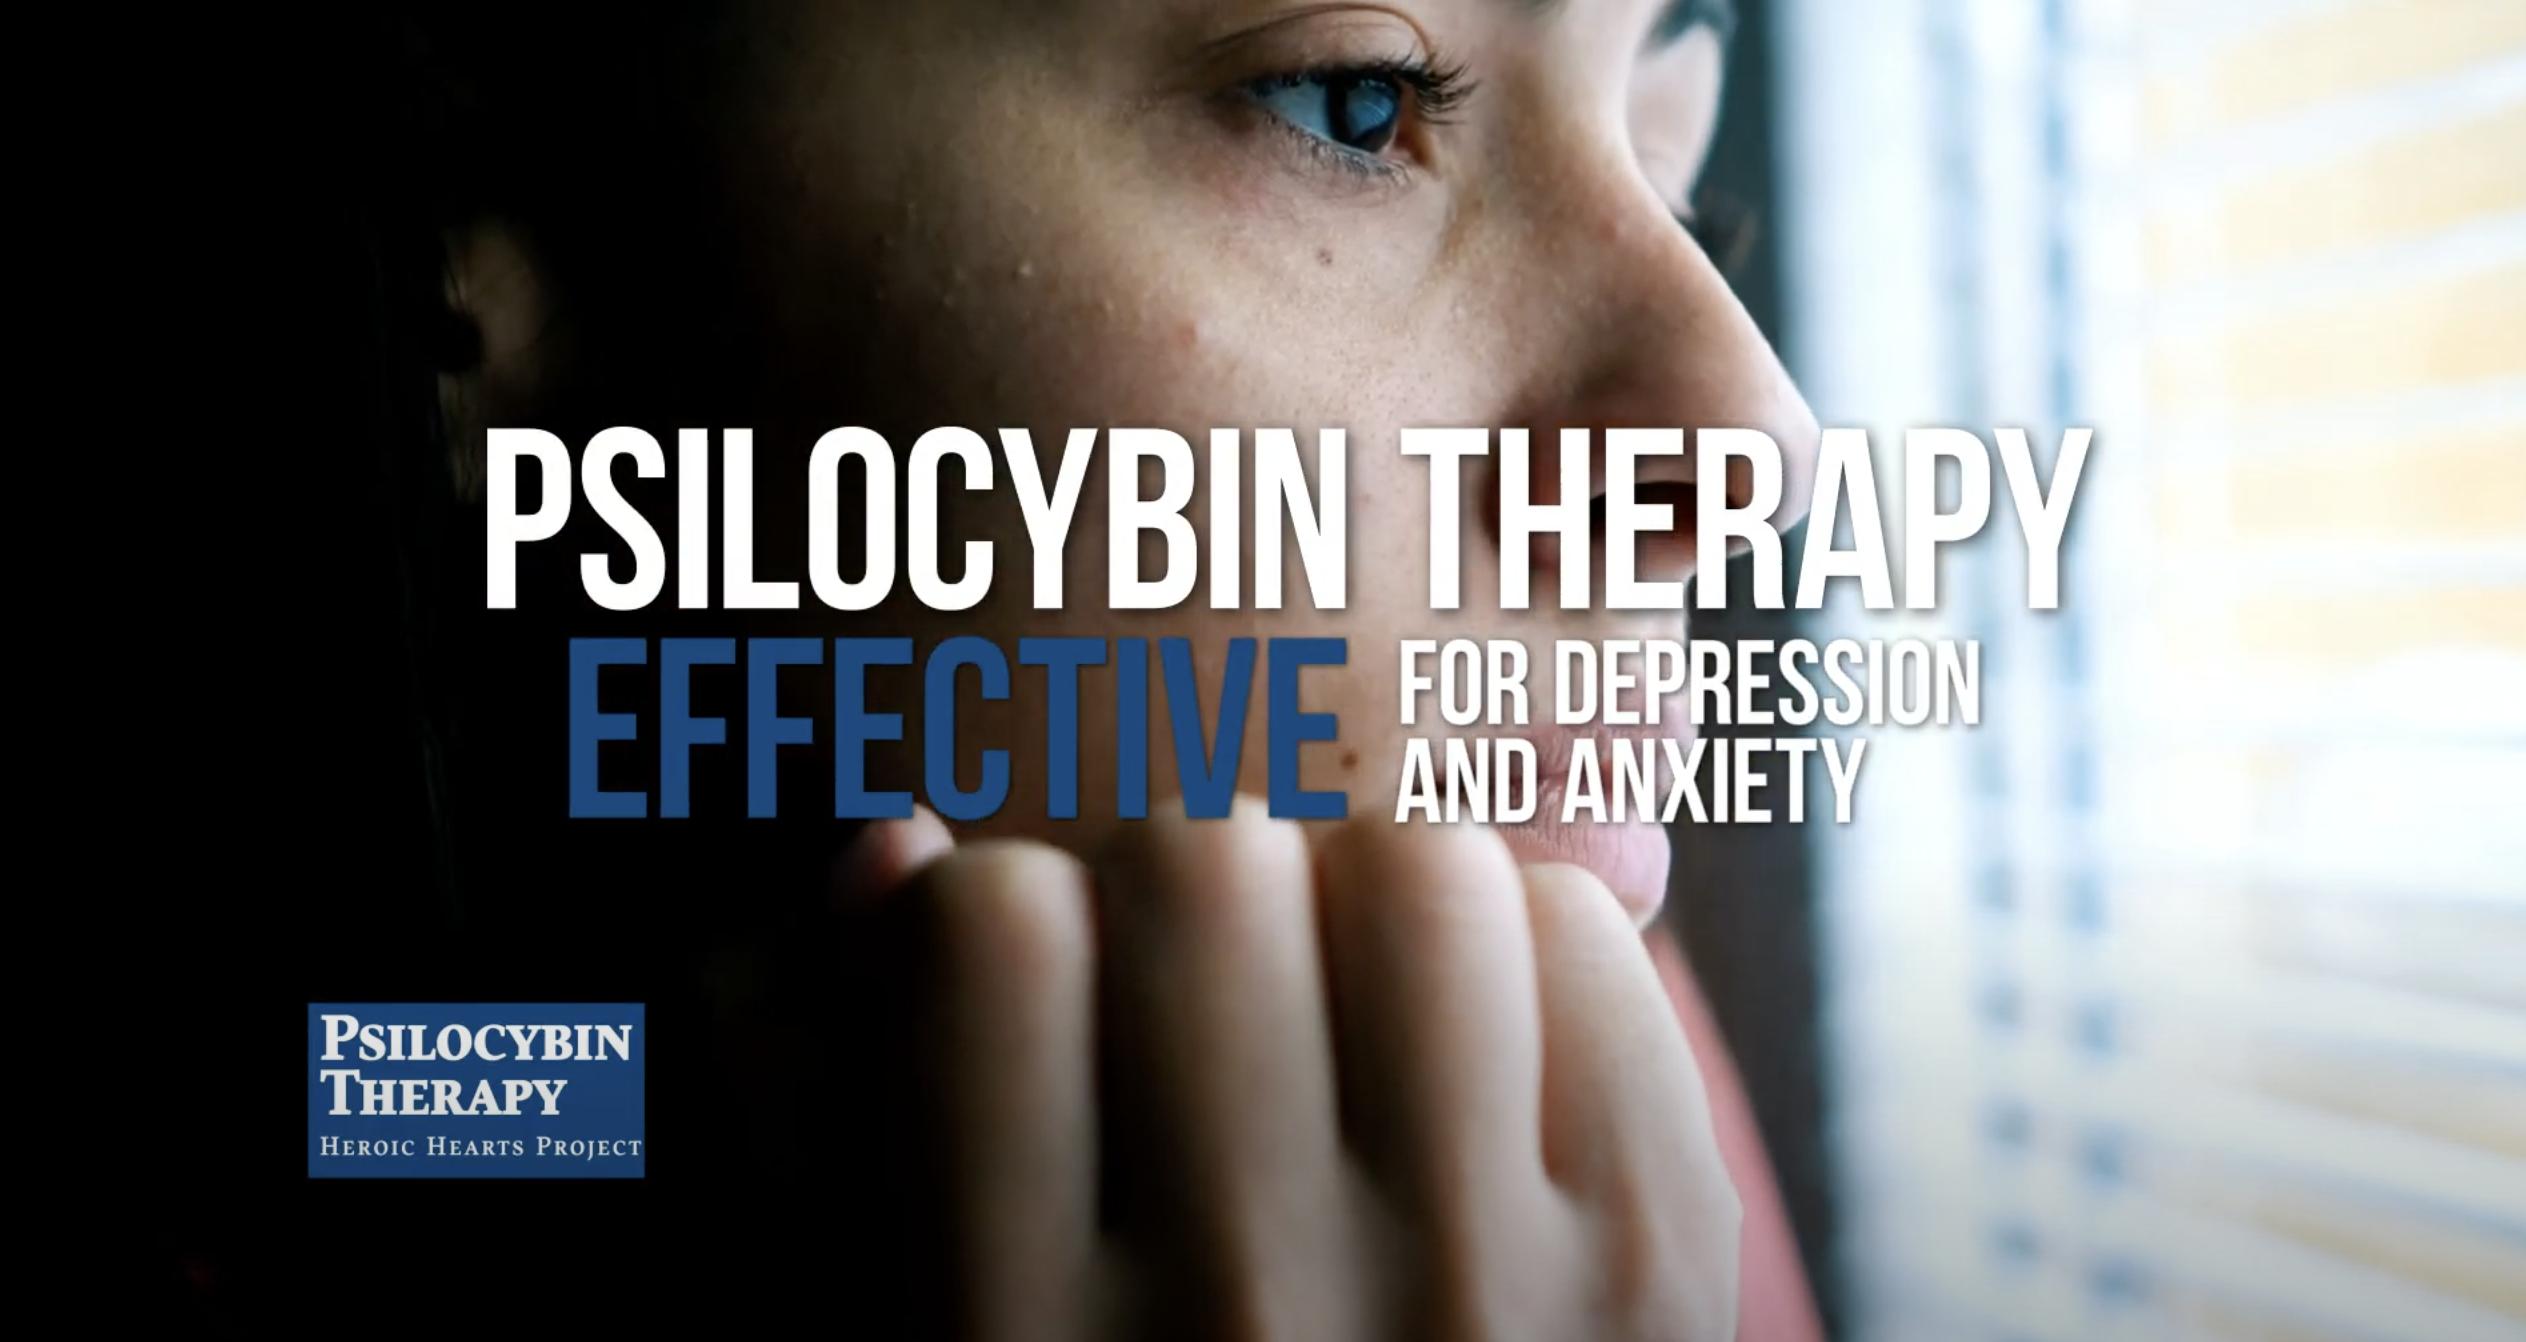 TV Ad Supports Psilocybin Legalization